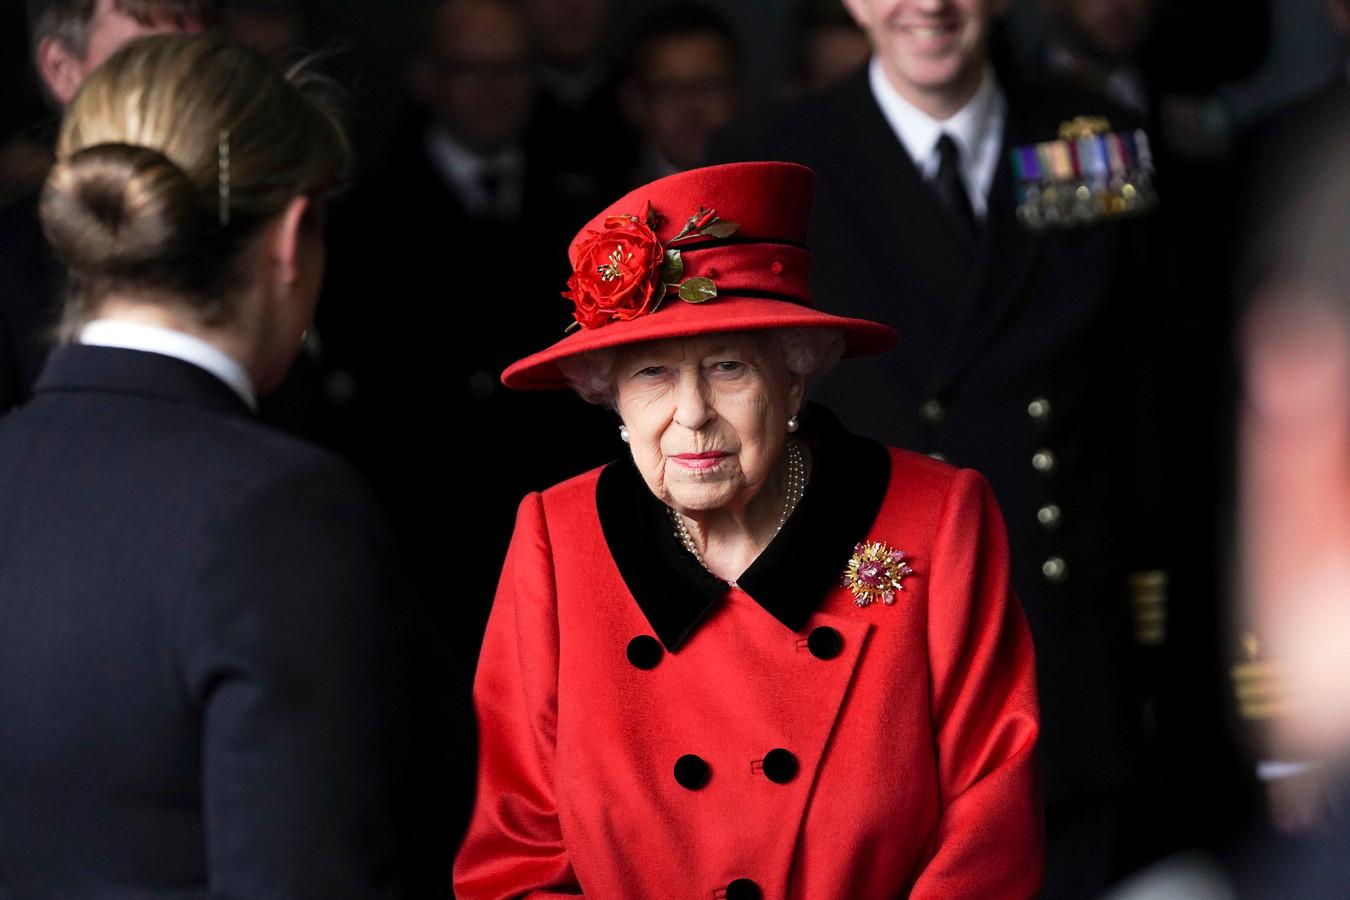 Élisabeth II, reine du Royaume-Uni